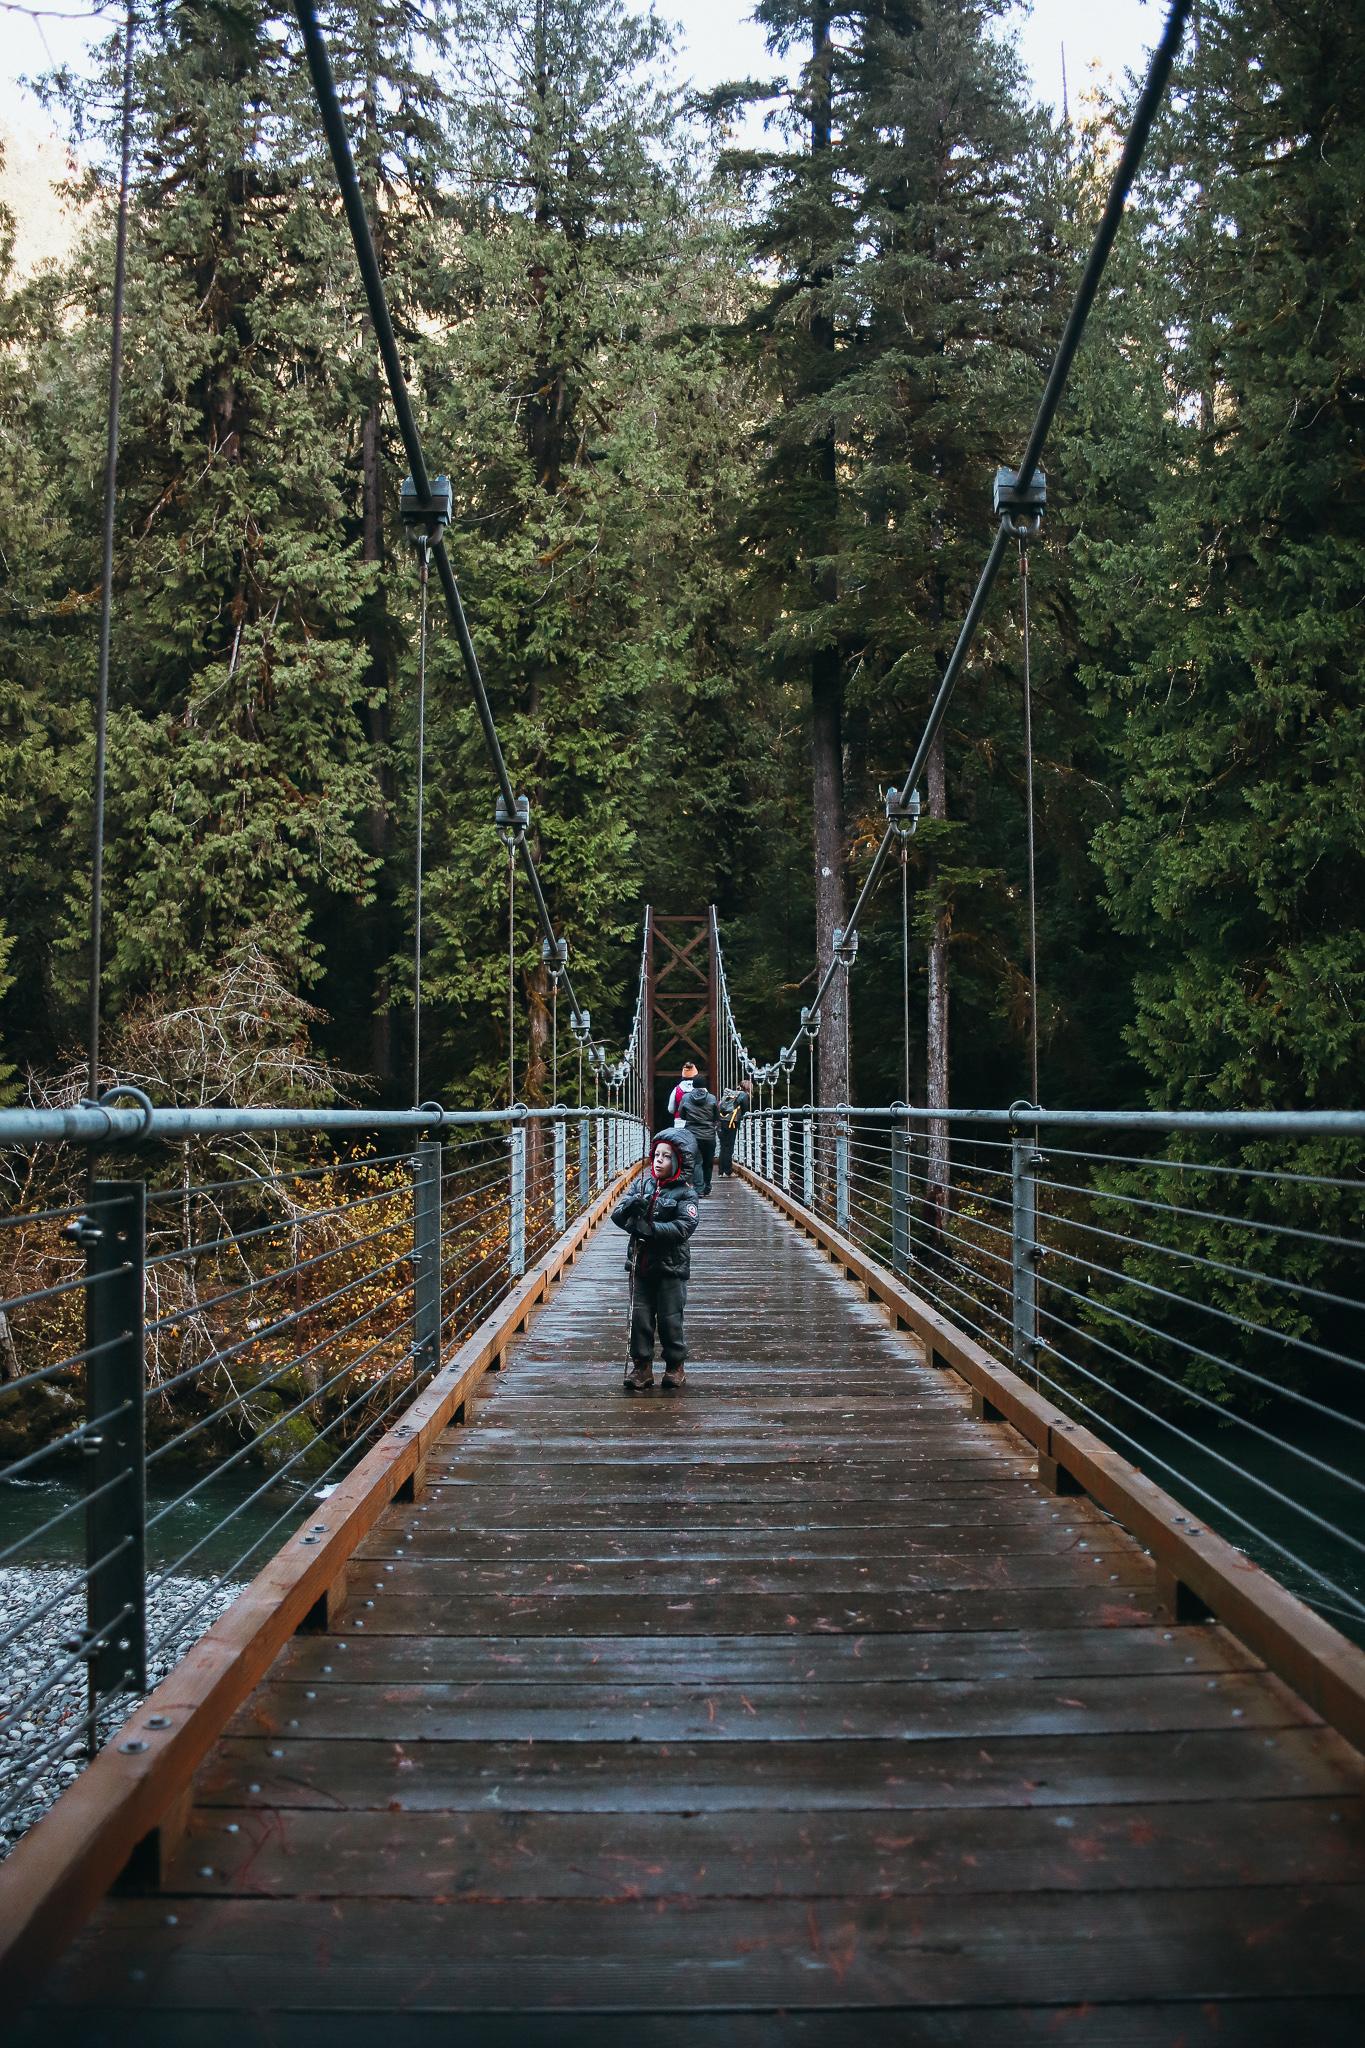 exploring the bridge